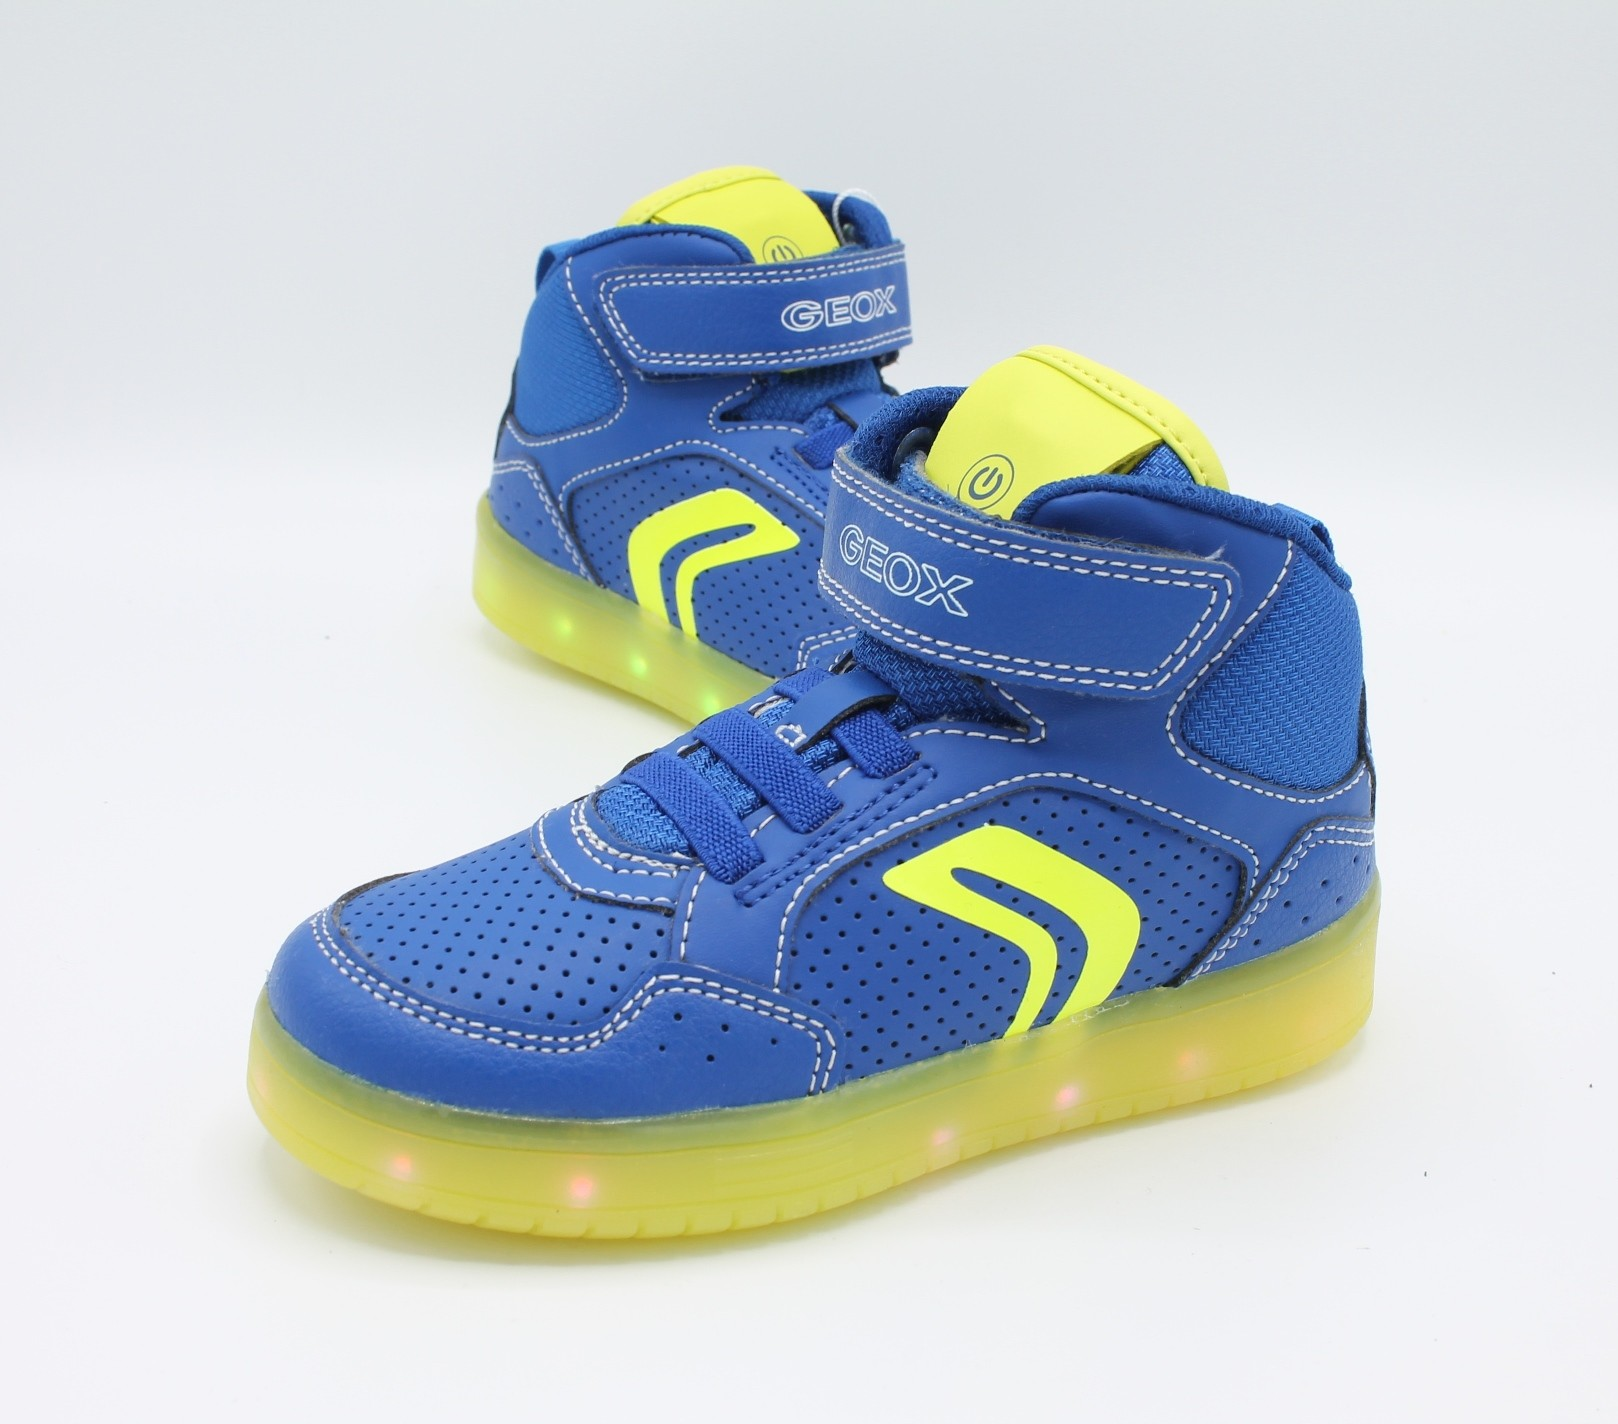 Geox Scarpe da Bambino con luci led Kommodor Blu J825PC